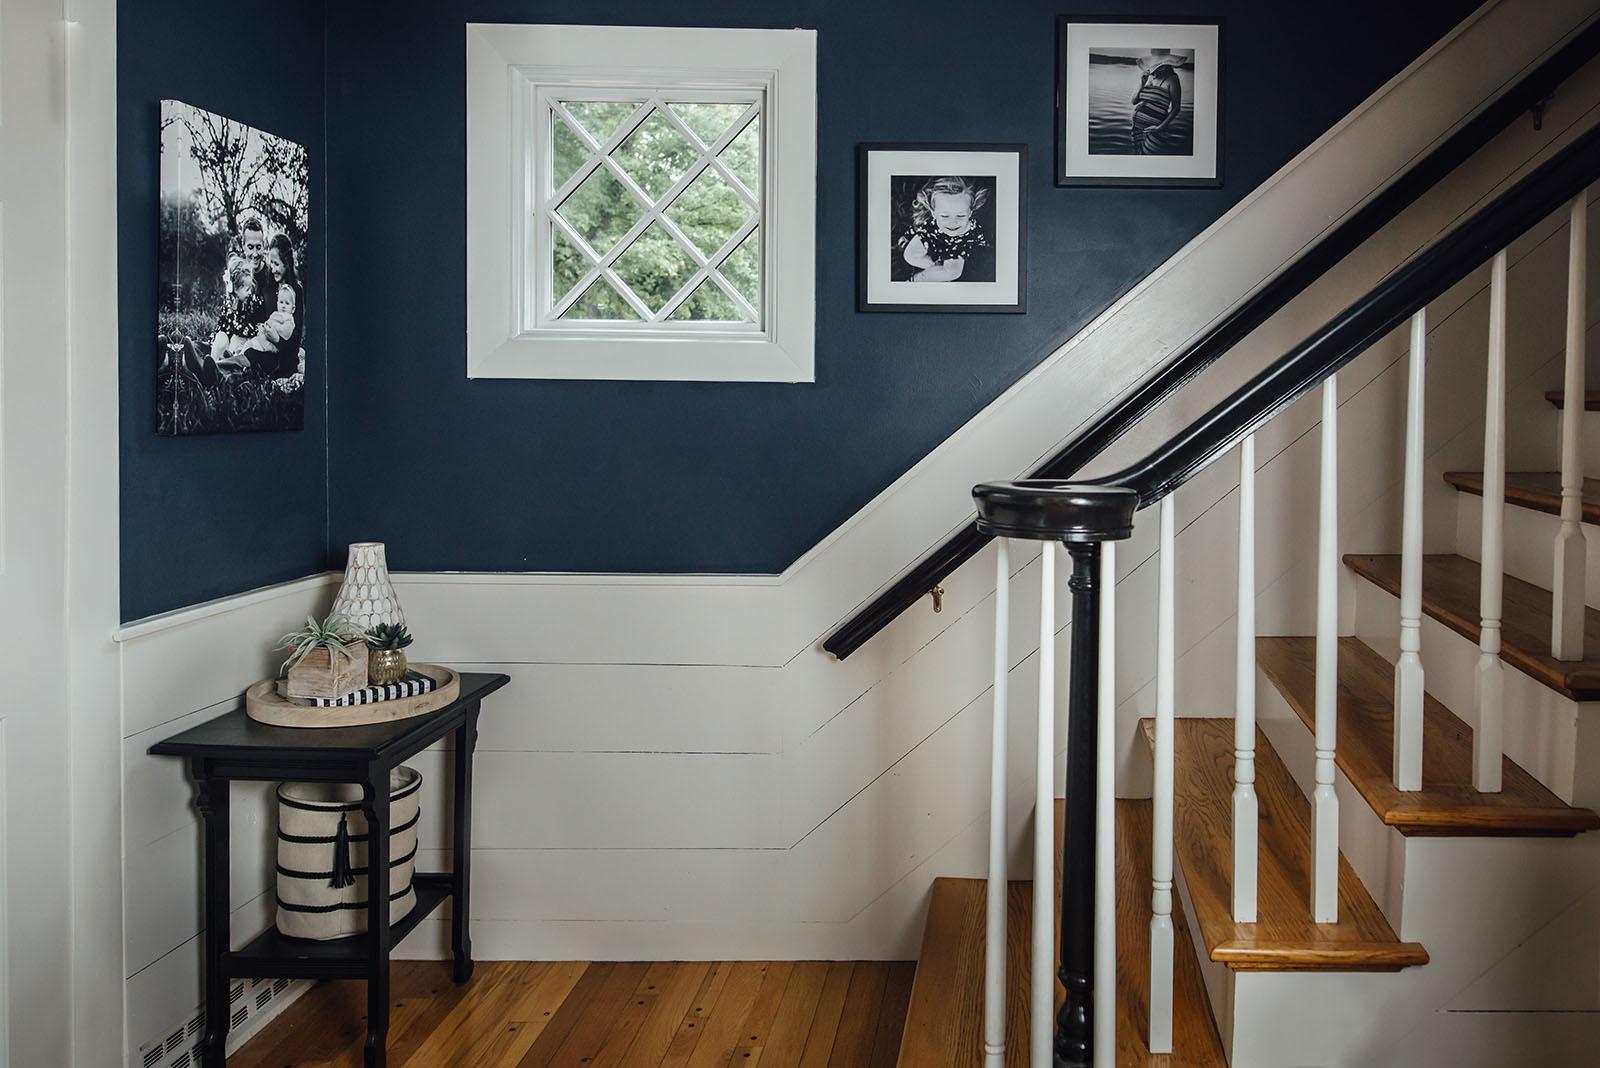 Photo décor: Stylish ideas for home photo display